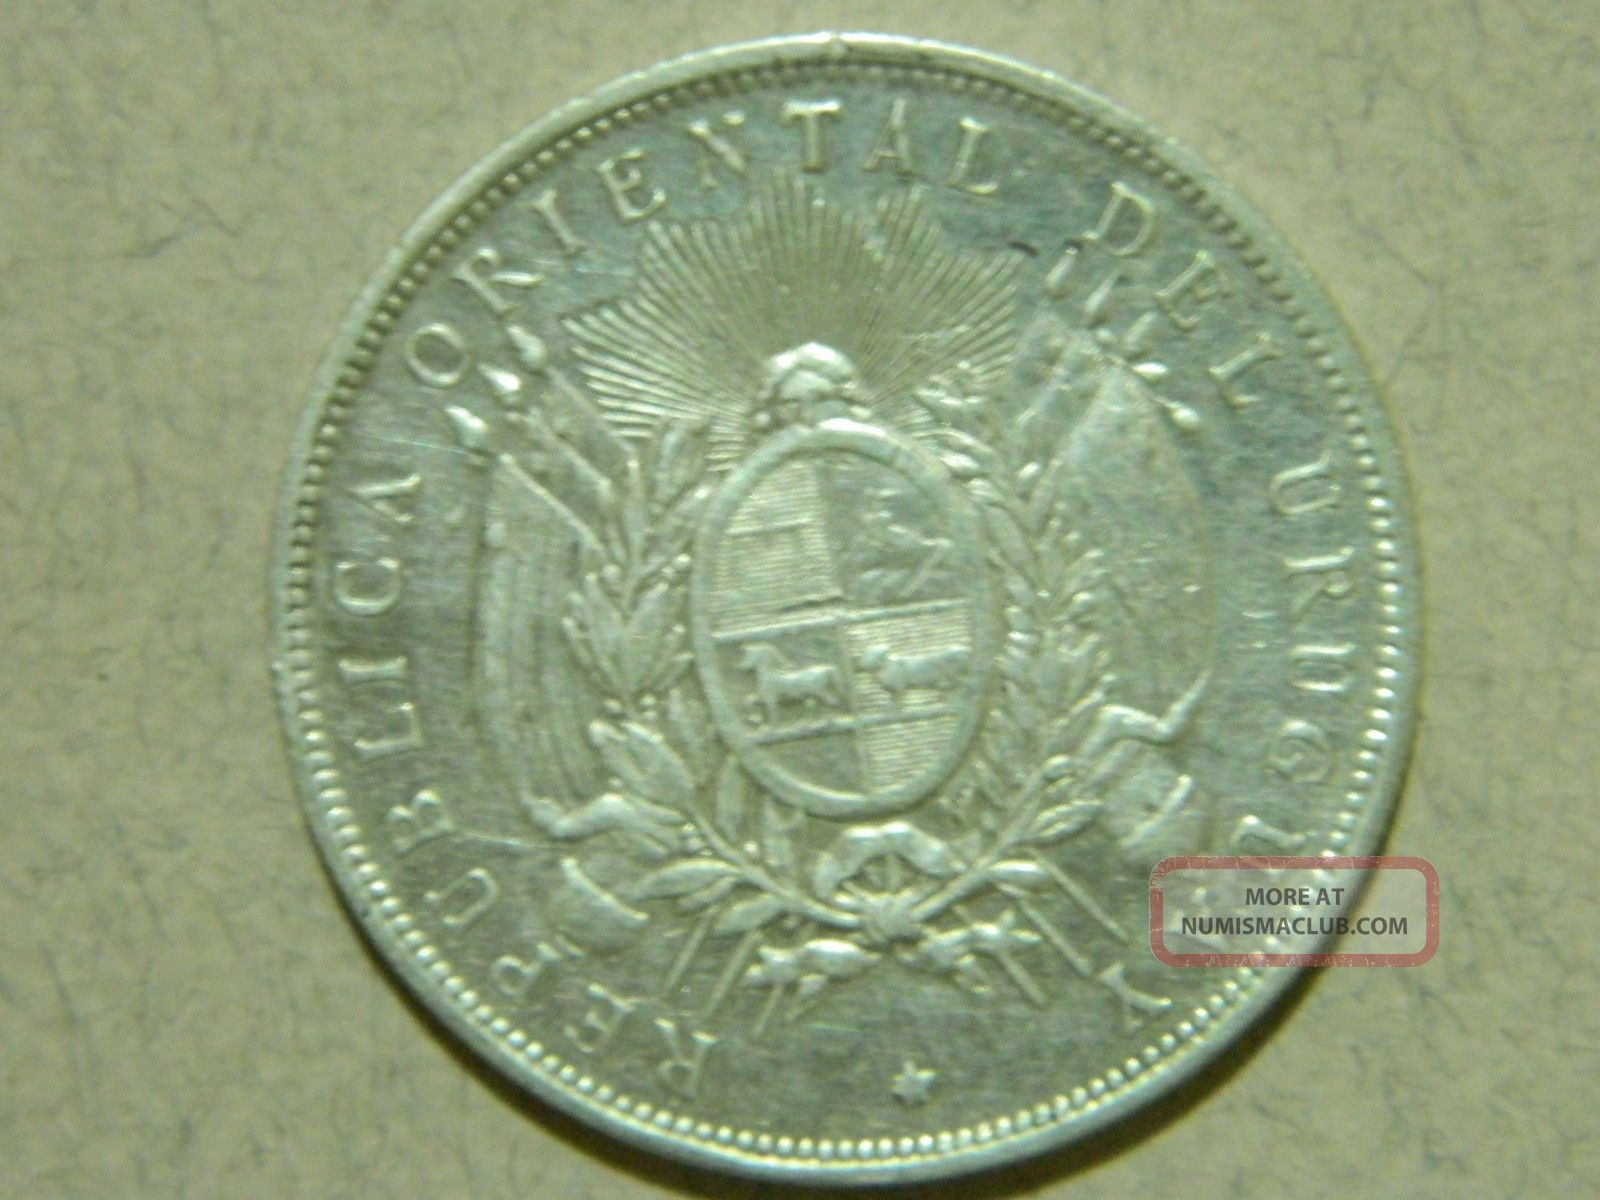 1893 Uruguay 1 Peso Silver Coin.  Actual Images. South America photo